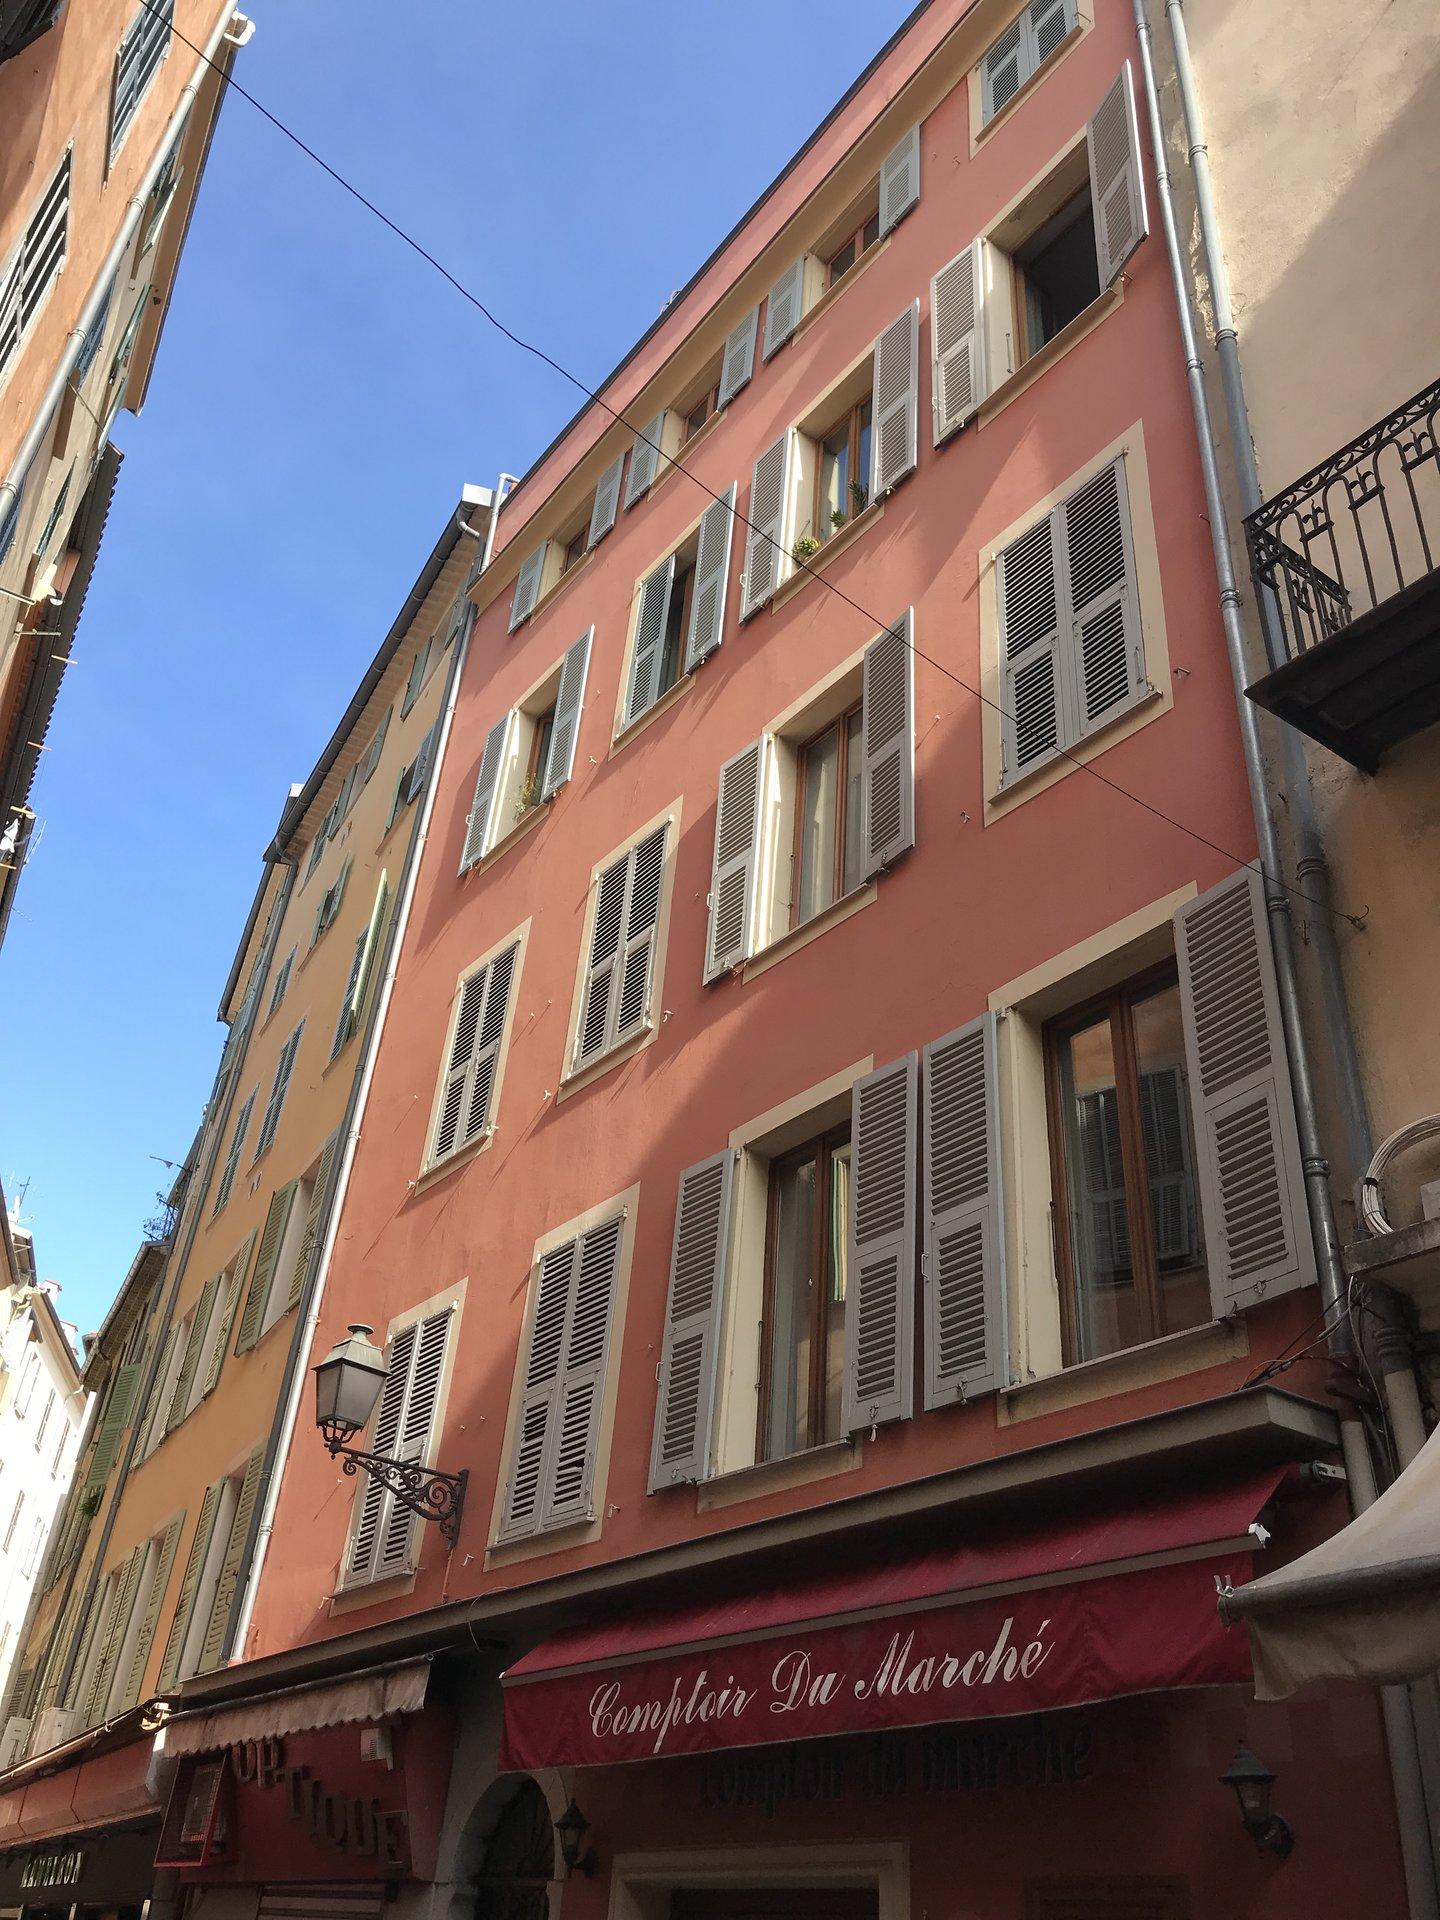 2P Vieux Nice